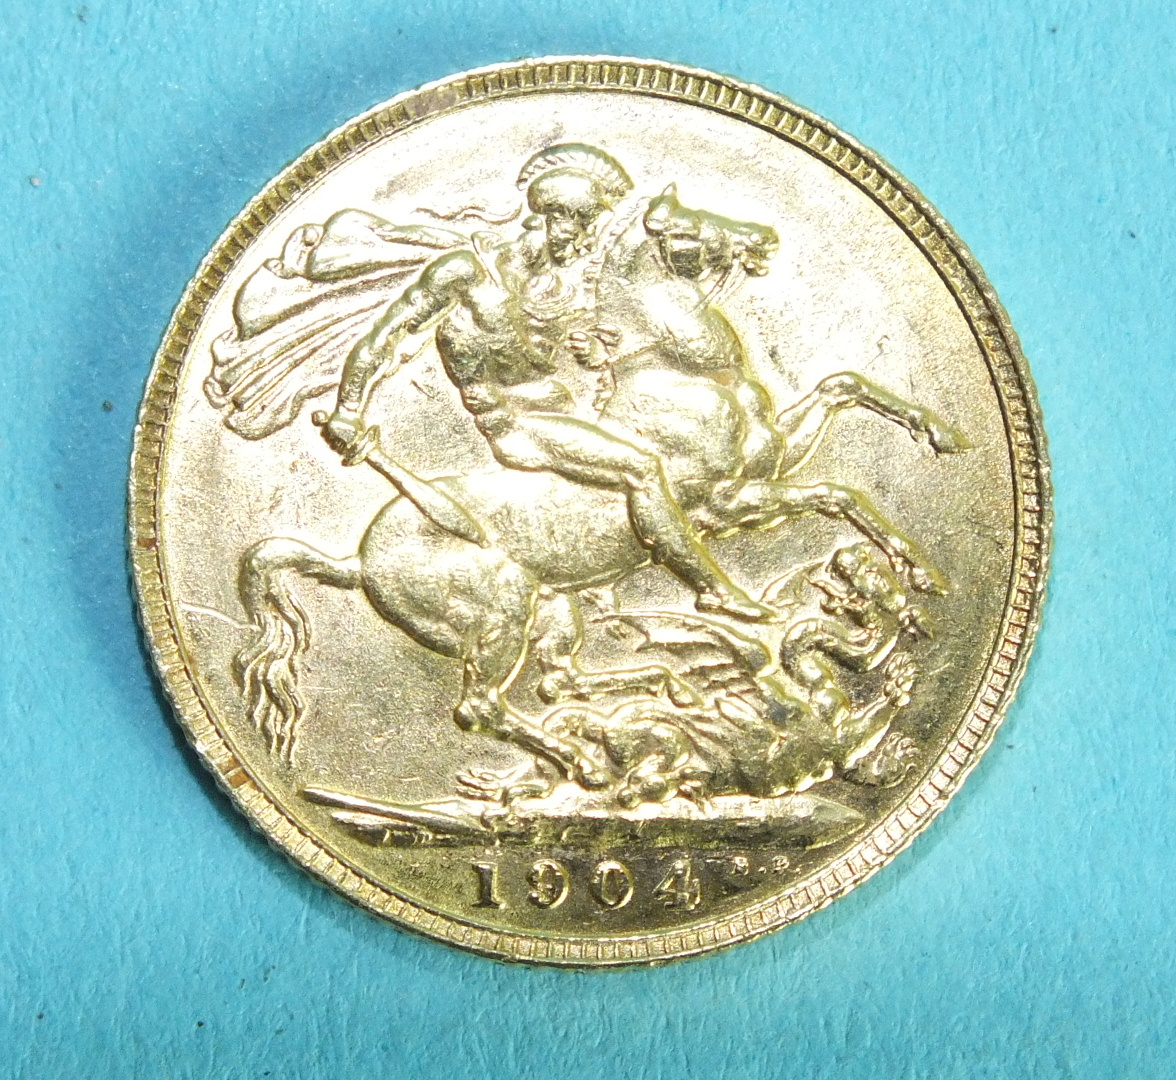 Lot 369 - An Edward VII 1904 sovereign.